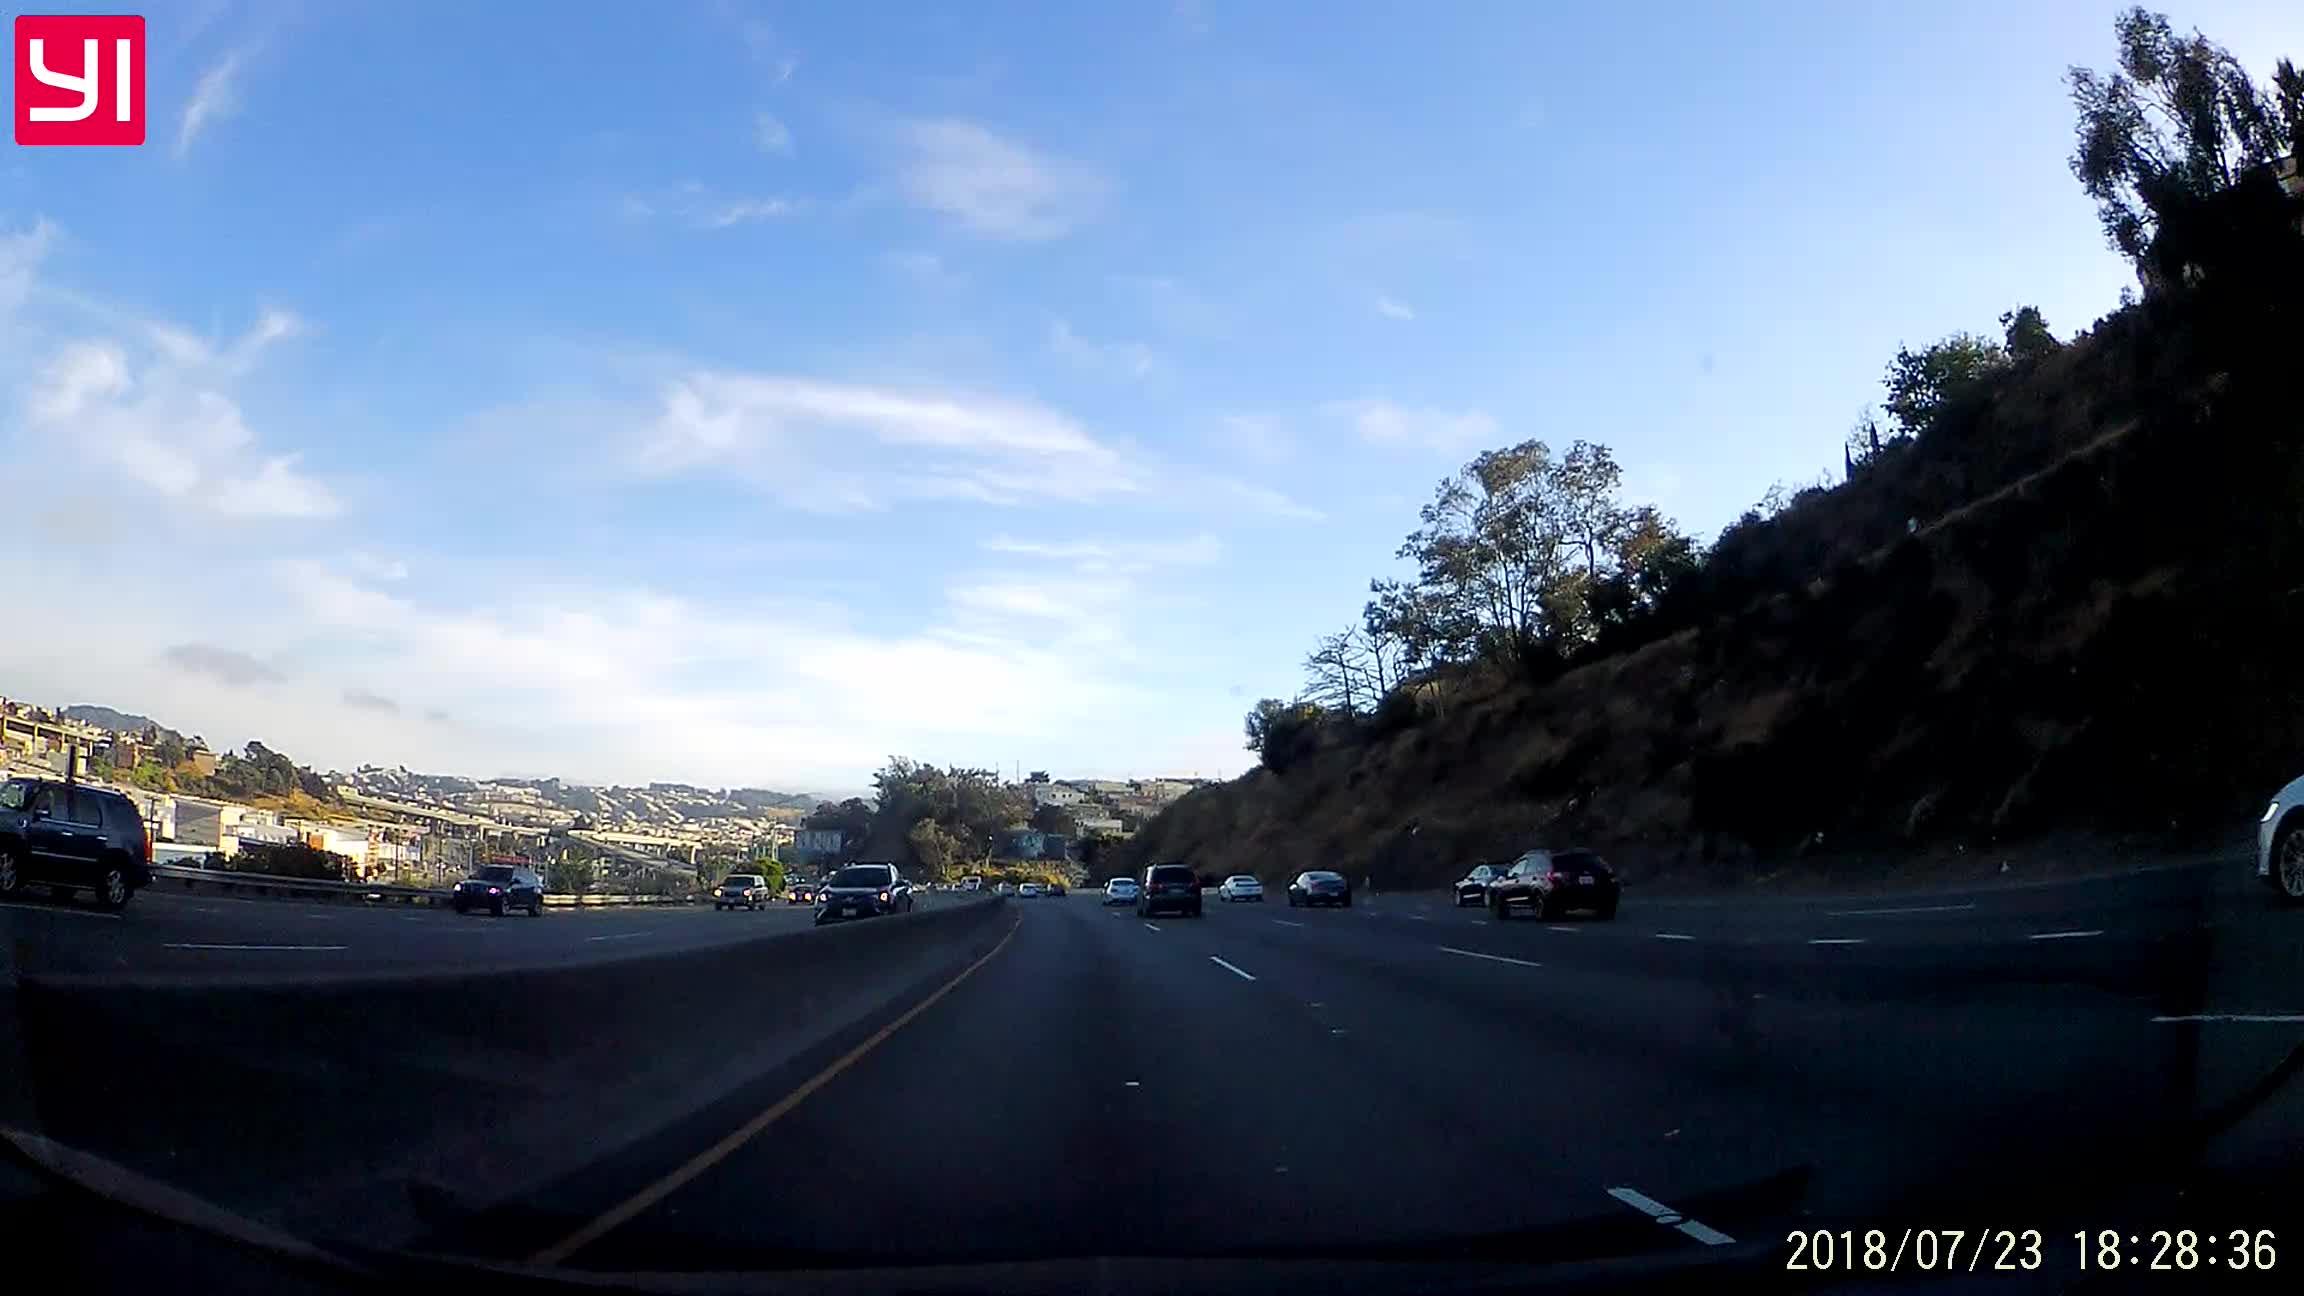 accident, car, crash, dash cam, dashcam, road cam, roadcam, san francisco, Car does a headstand on US 101-N in San Francisco GIFs